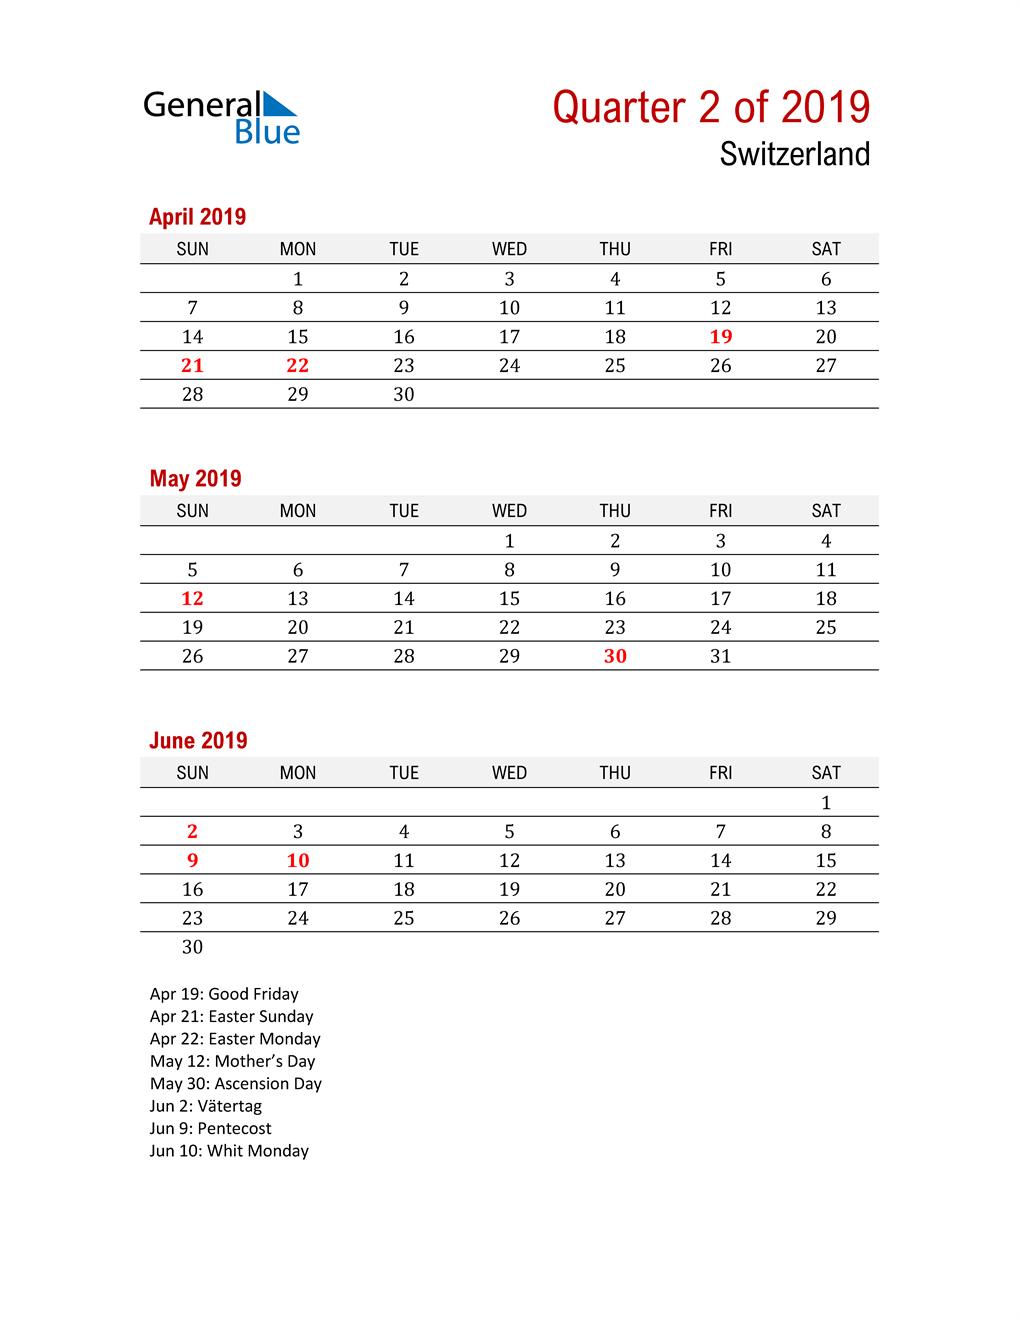 Printable Three Month Calendar for Switzerland